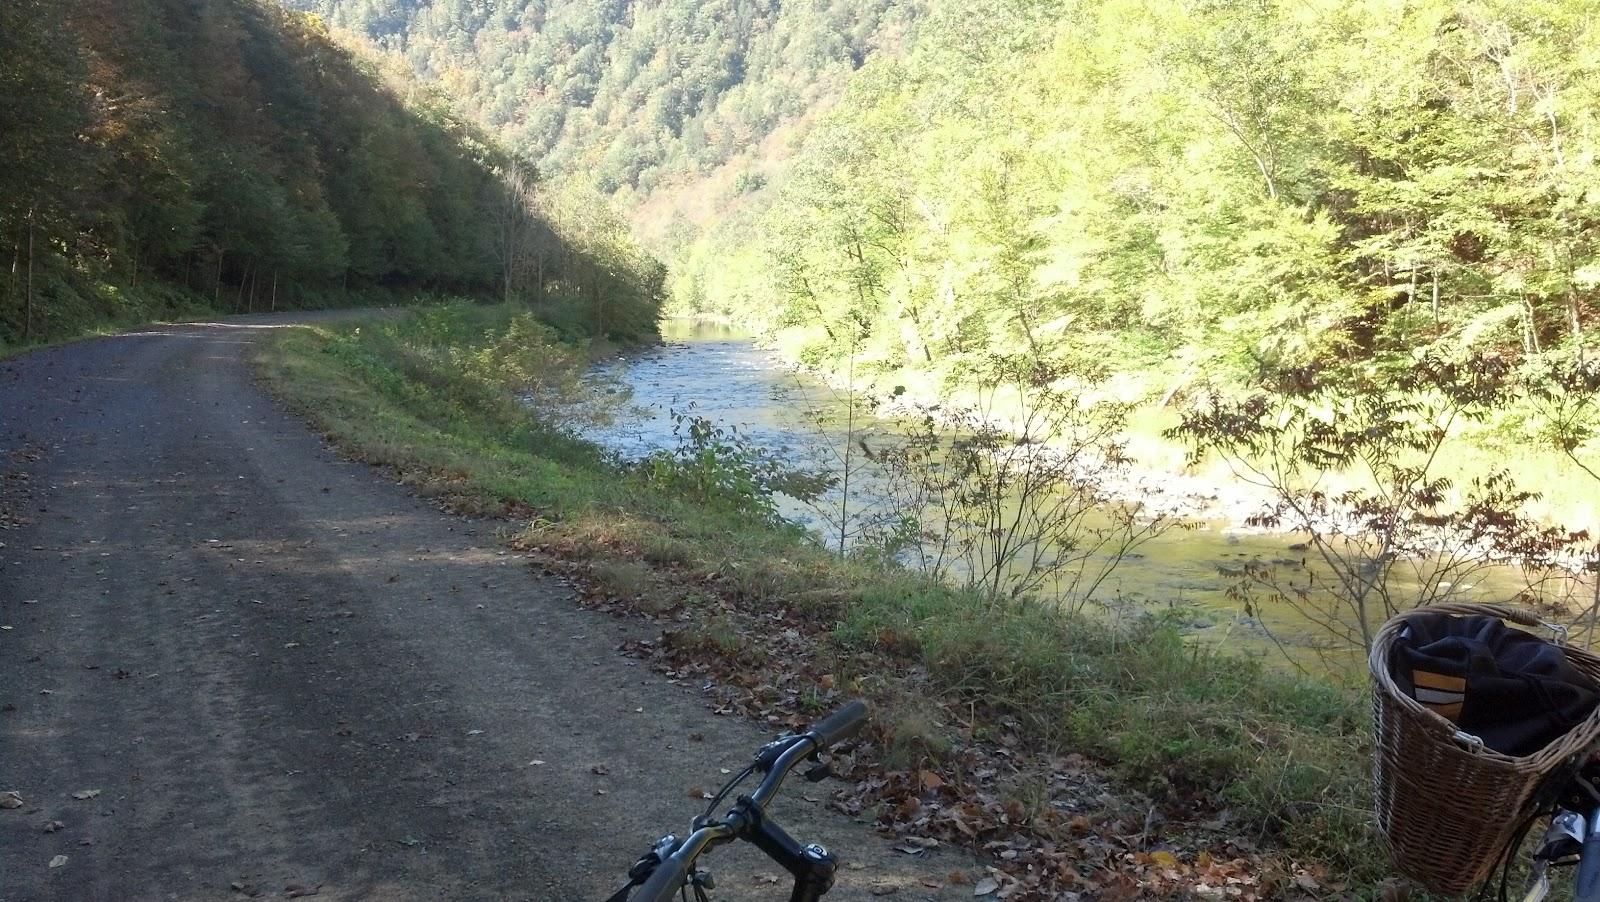 Biking The Pine Creek Rail Trail